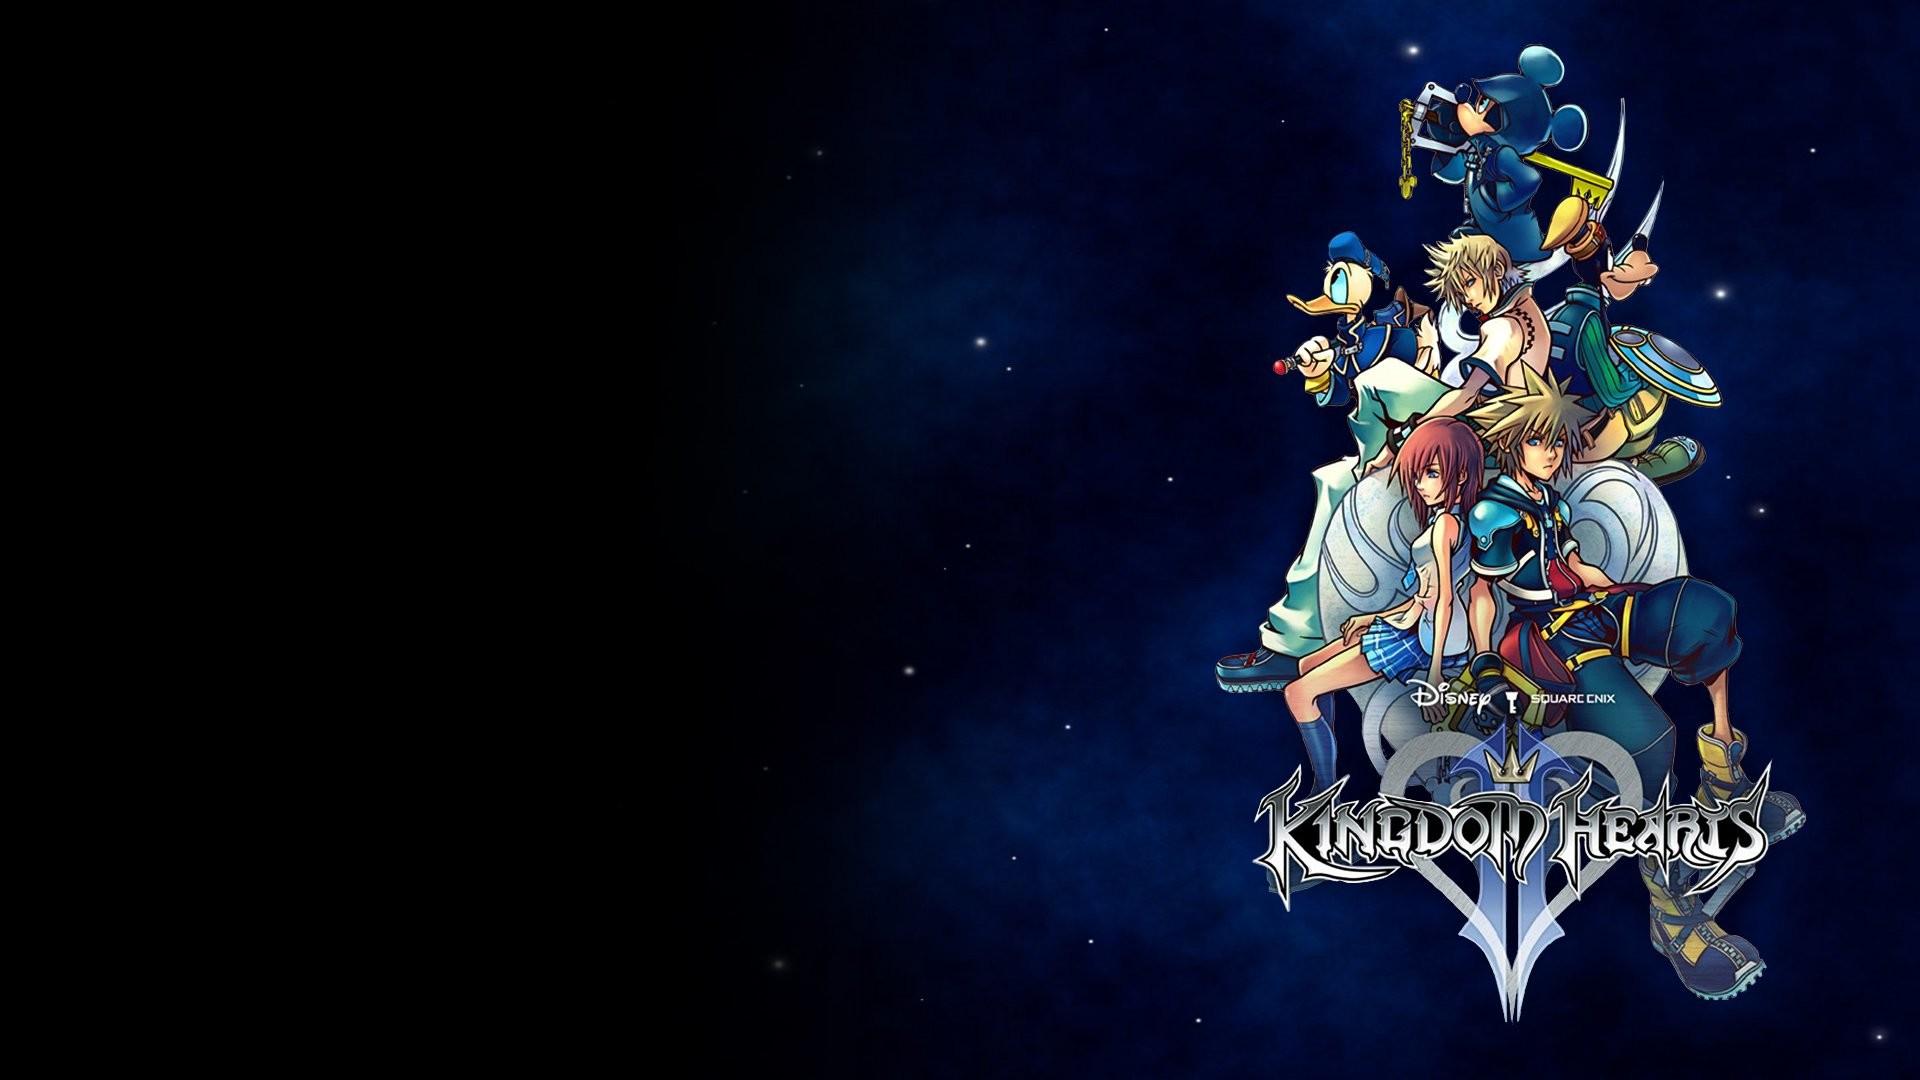 Kingdom Hearts 2 Wallpapers Wallpapertag